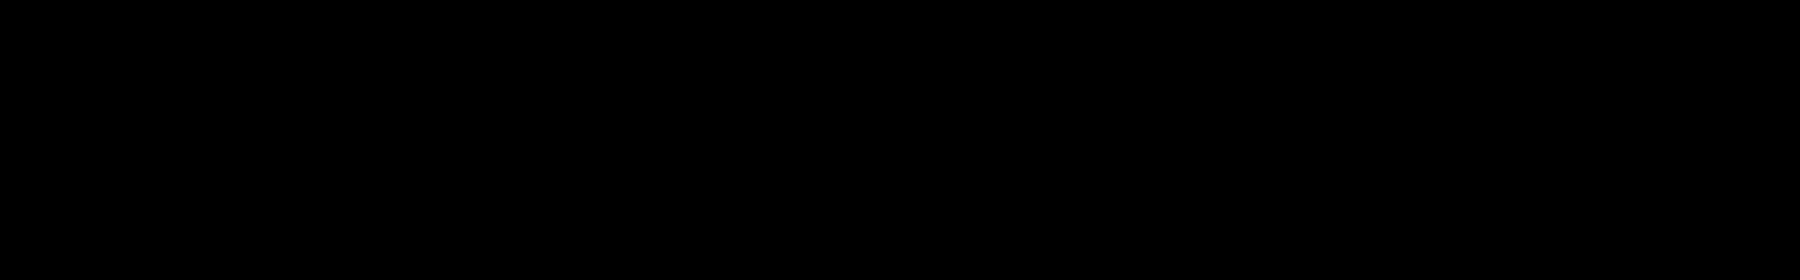 Halogen - Dark Ambient Loops audio waveform